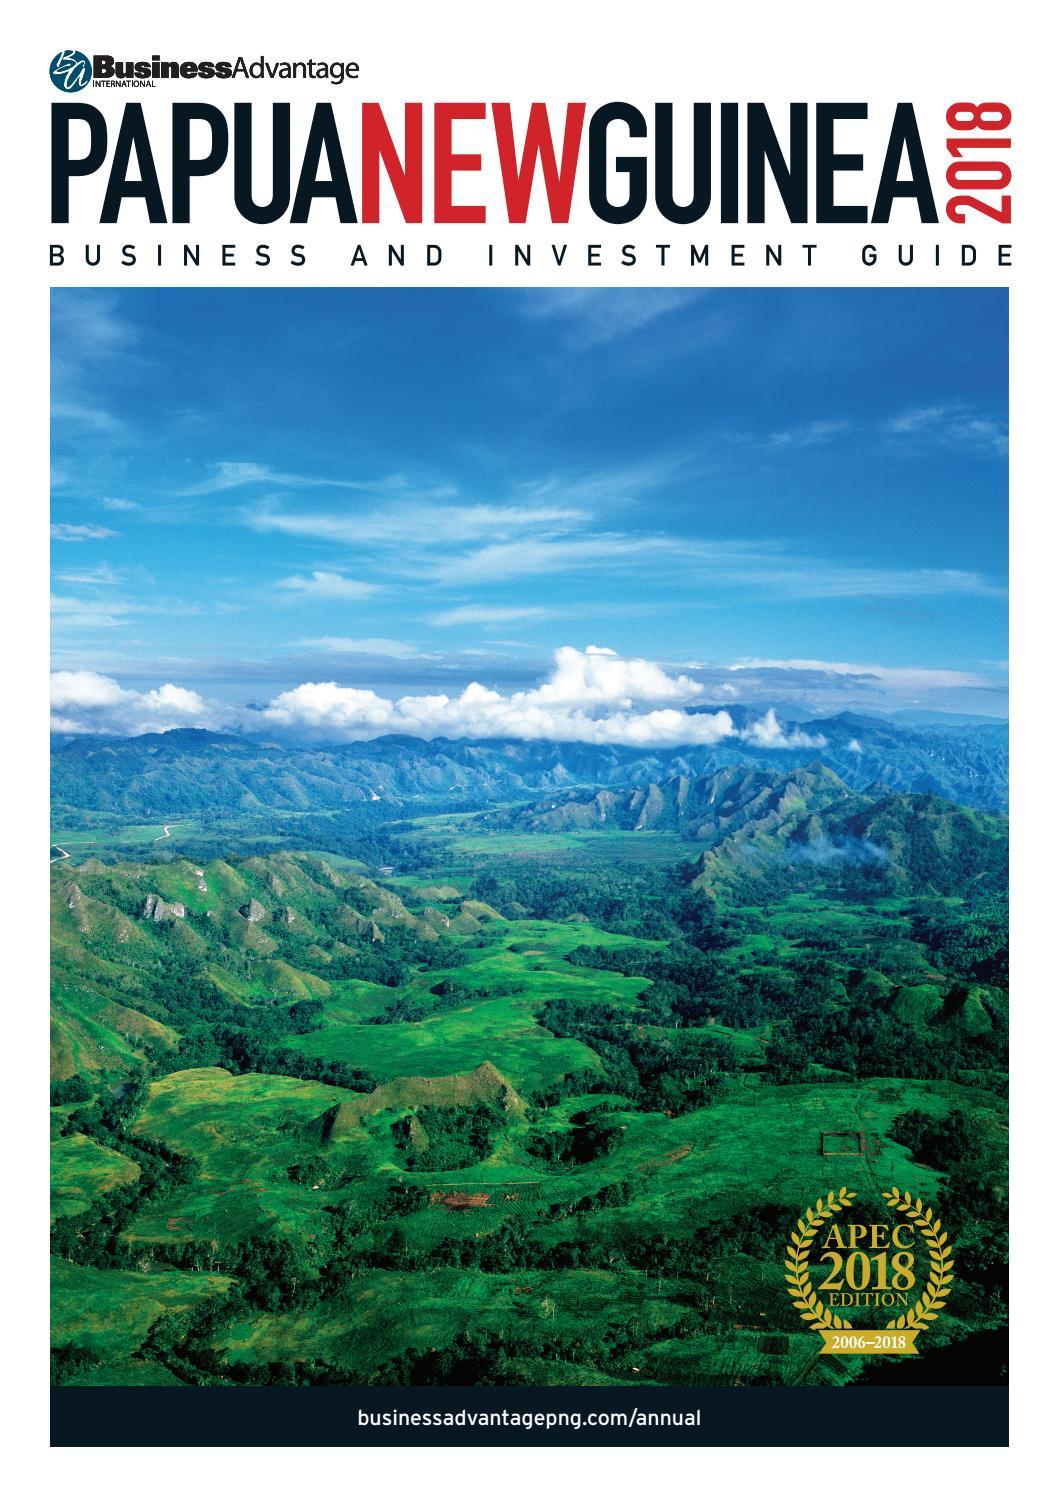 Business Advantage Papua New Guinea 2018 By Bike Tool 15 In 1 With Chain Cutter United Hijau International Issuu